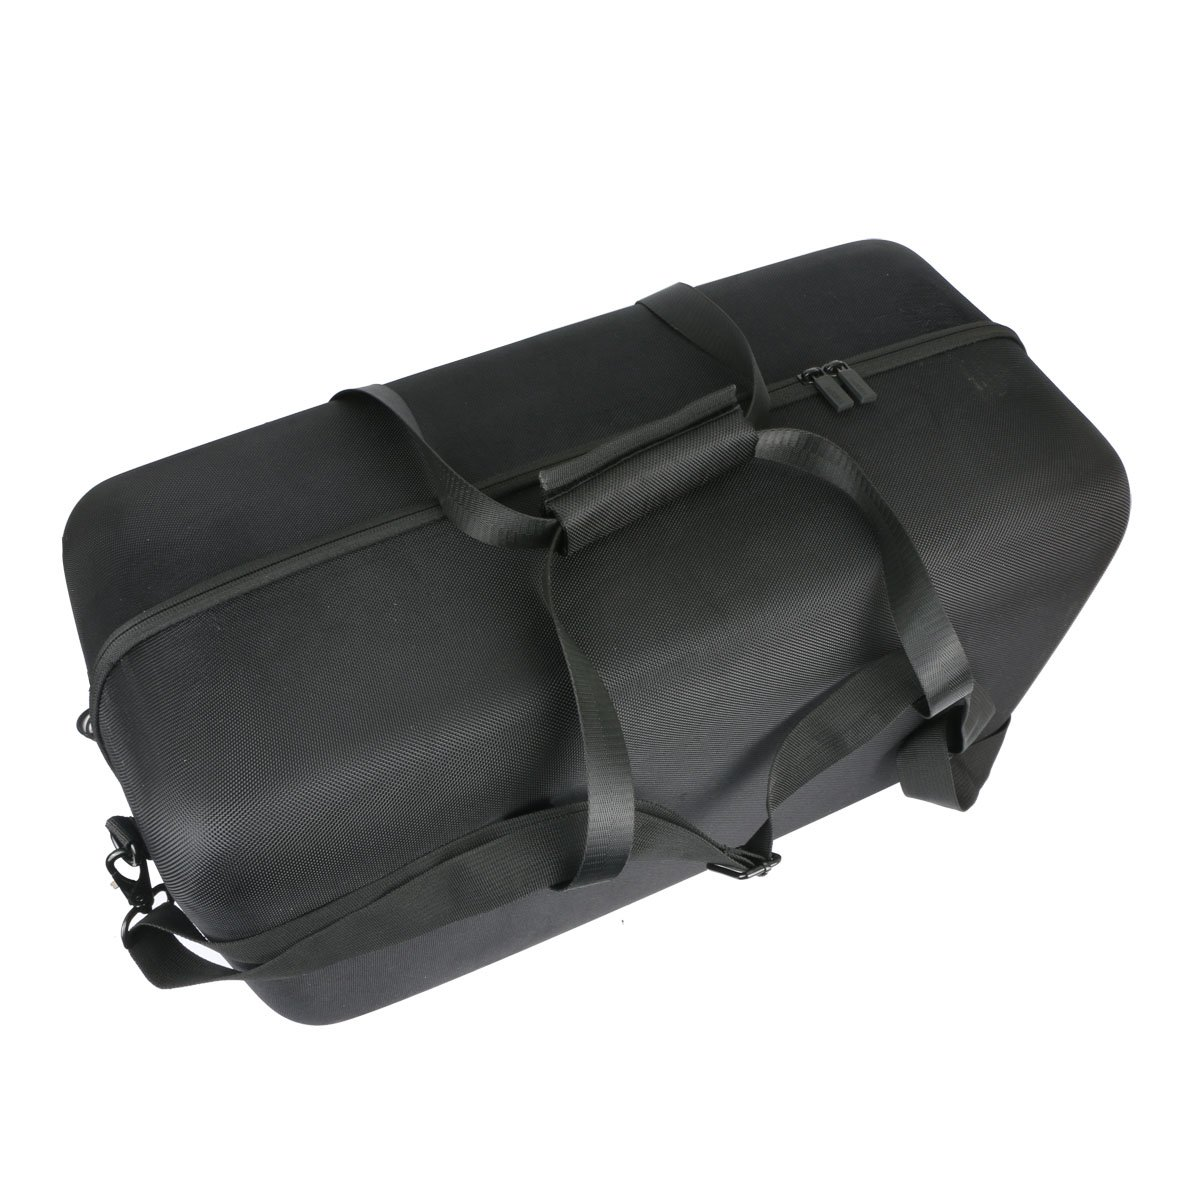 Hard Travel Case for Sony GTKXB60/B GTKXB60/L High Power Portable Bluetooth Speaker by co2CREA by Co2Crea (Image #8)